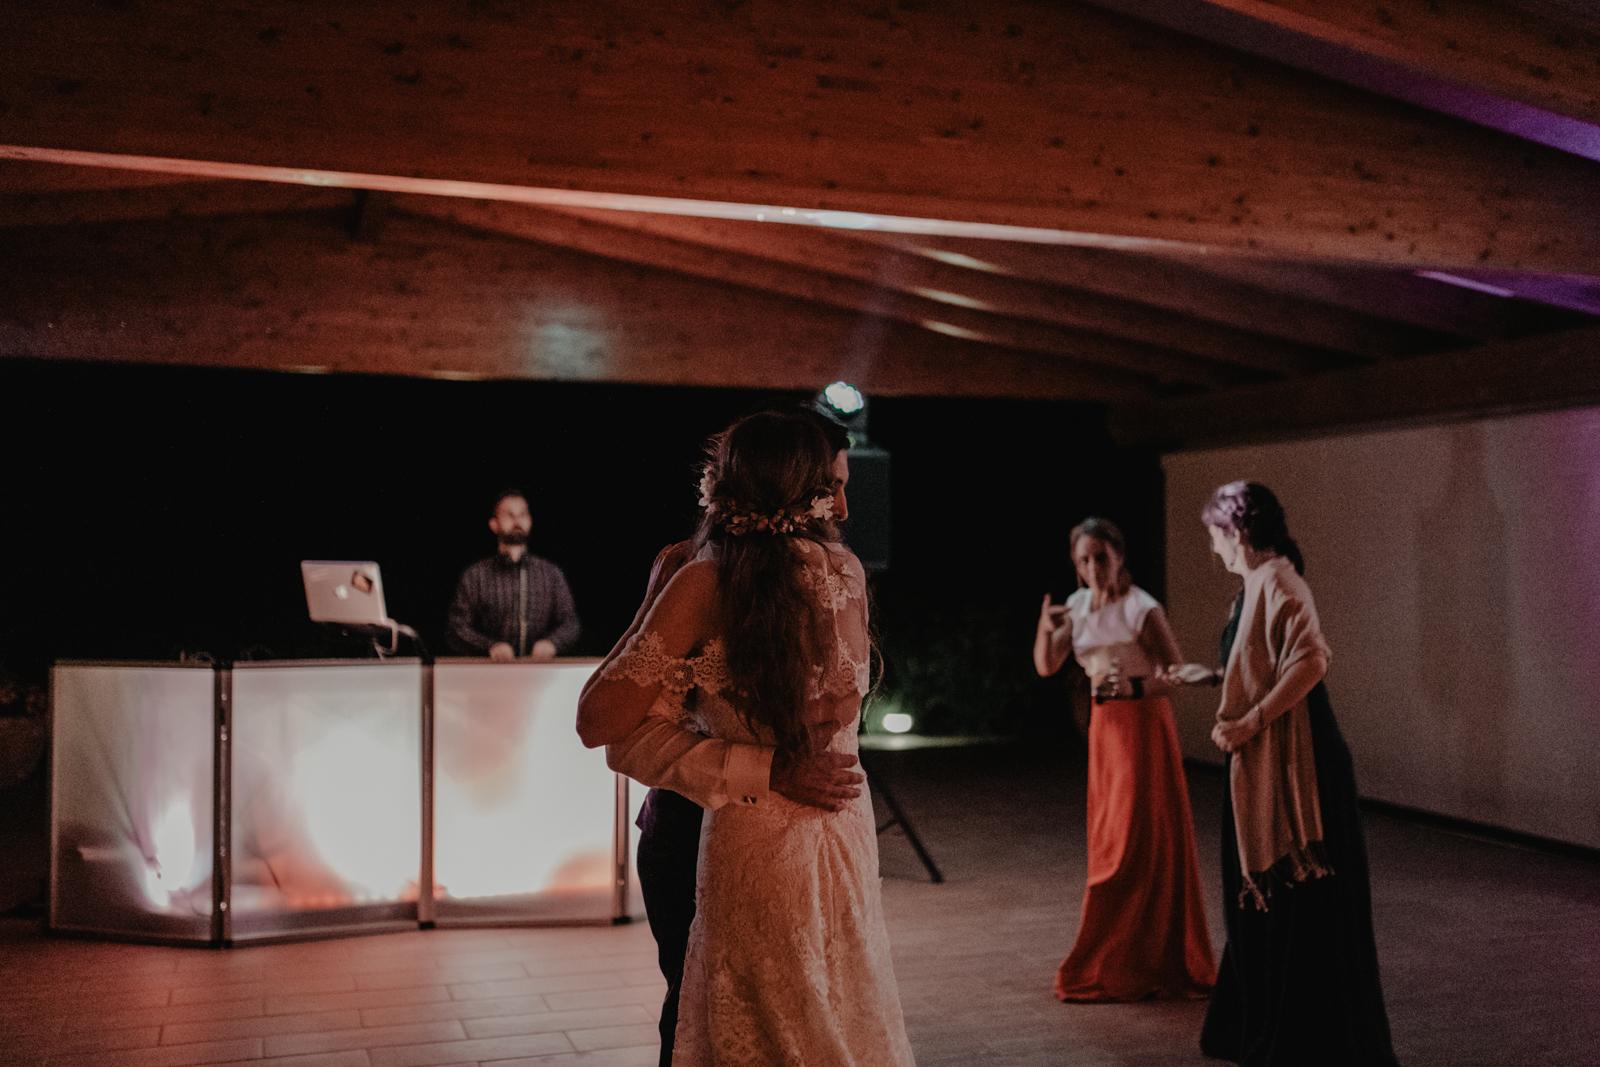 thenortherngirlphotography_photography_thenortherngirl_rebeccascabros_wedding_weddingphotography_weddingphotographer_barcelona_bodaenbarcelona_bodaenmaselmarti_bodarogeryvane-1043.jpg